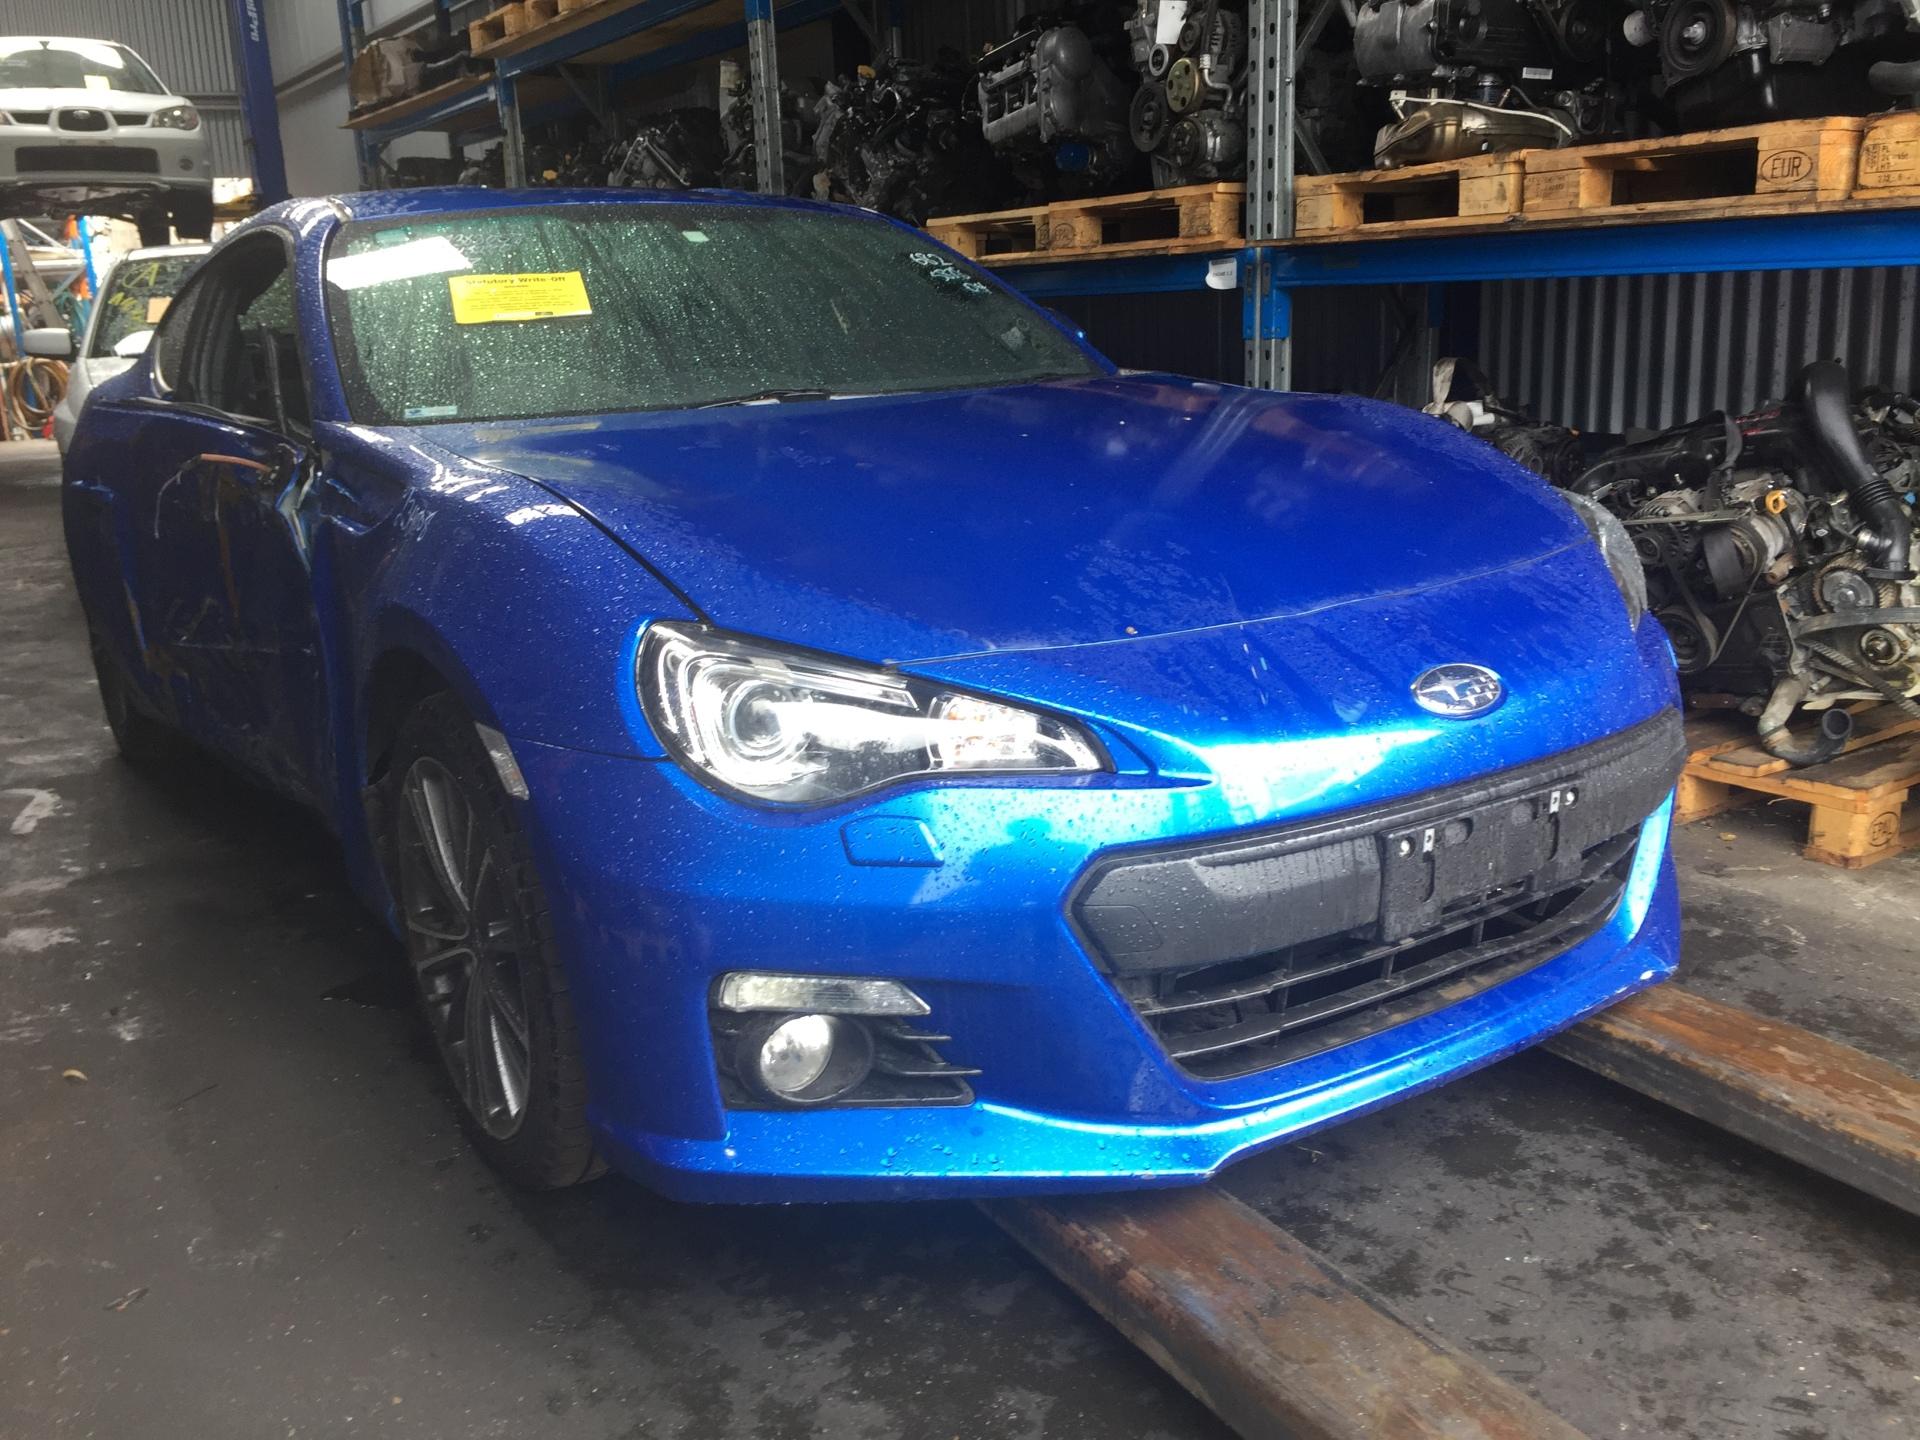 Subaru Wrecking BRZ Coupe Blue 2014 Spare Parts